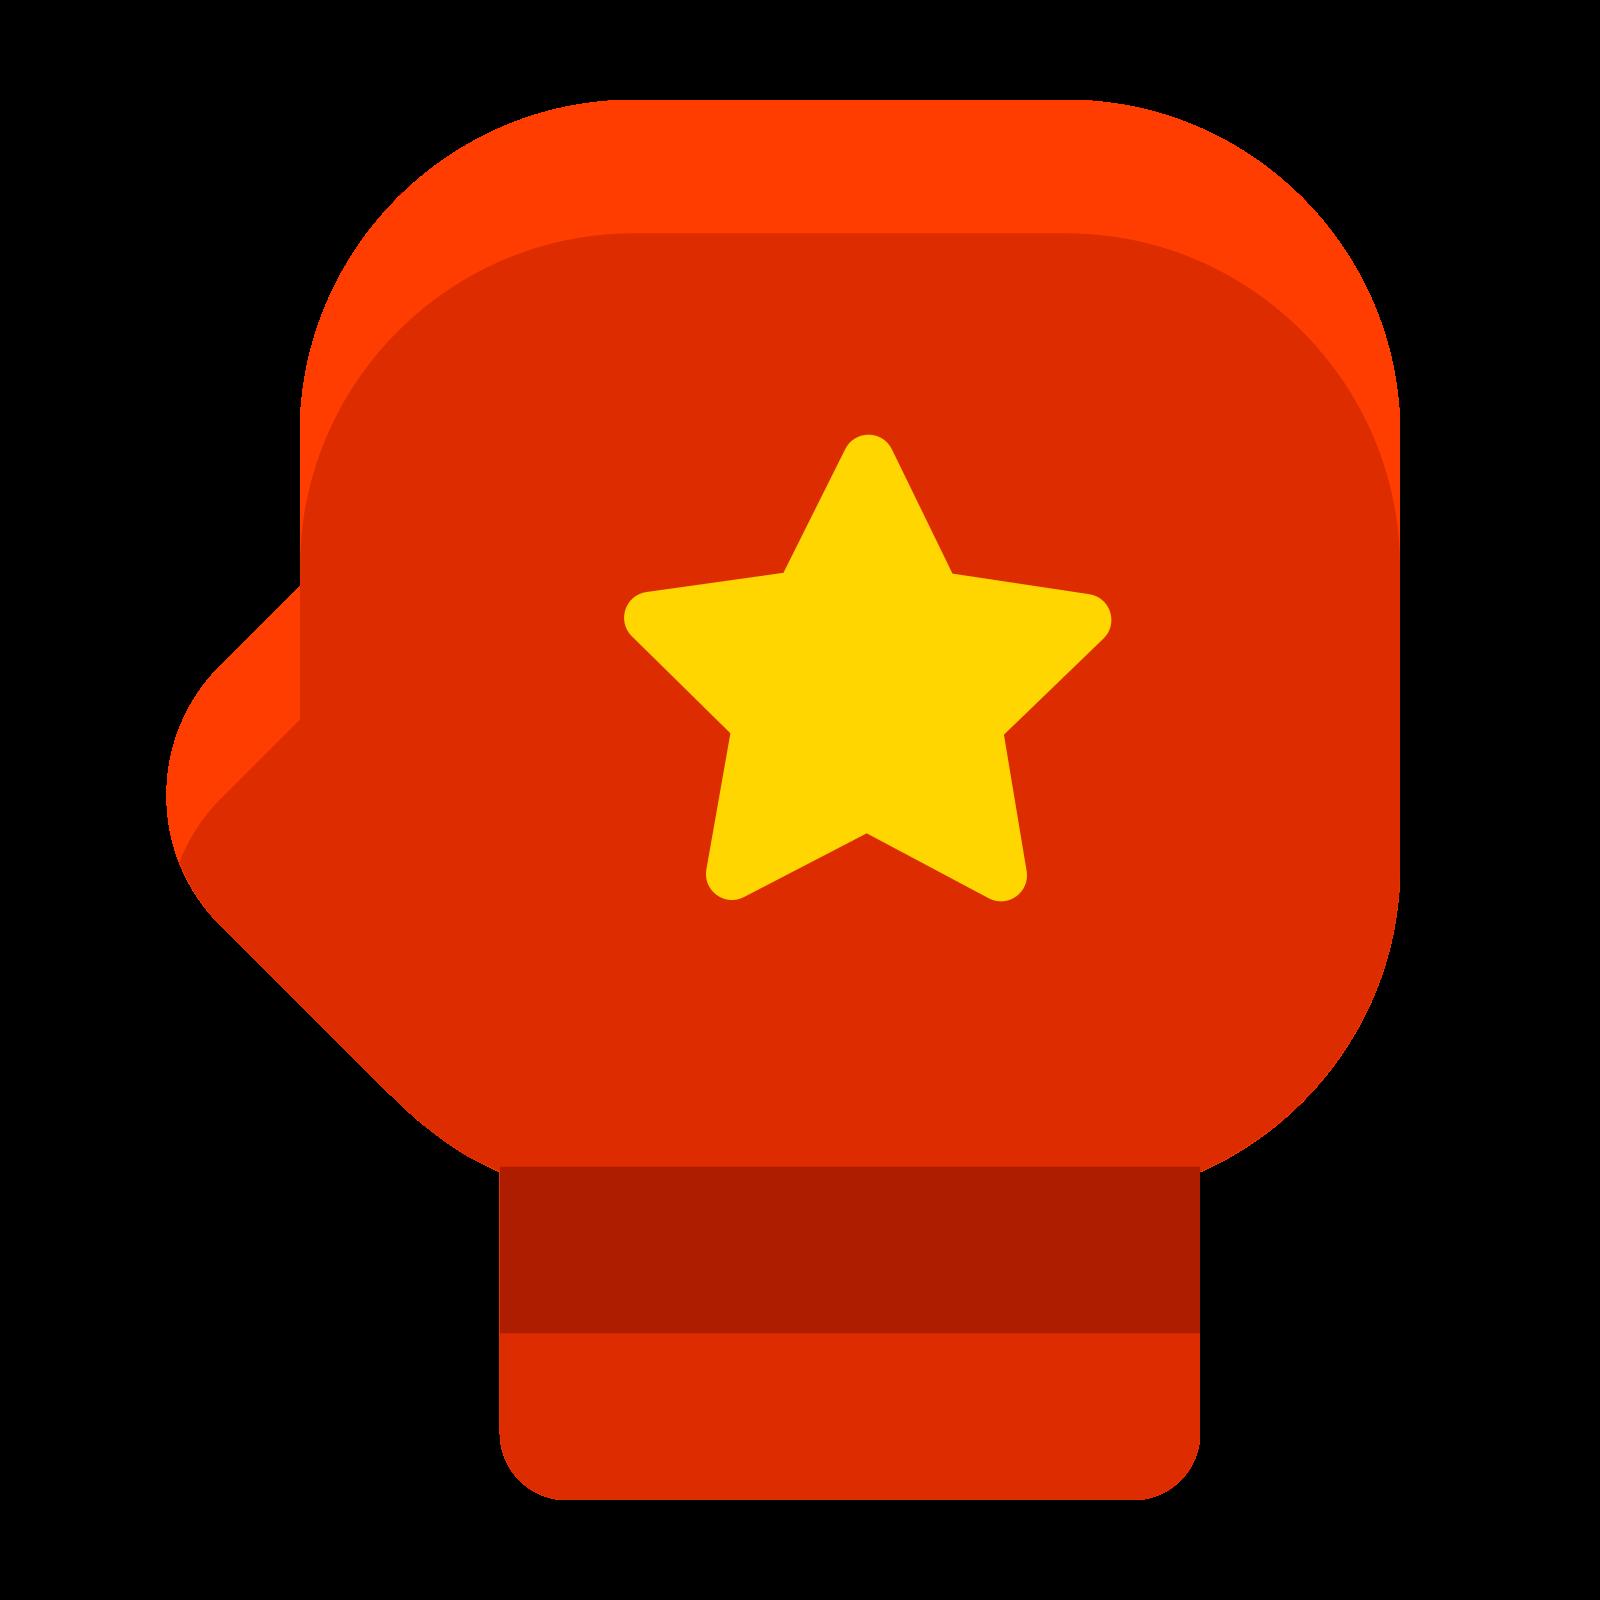 Fist Pokemon icon